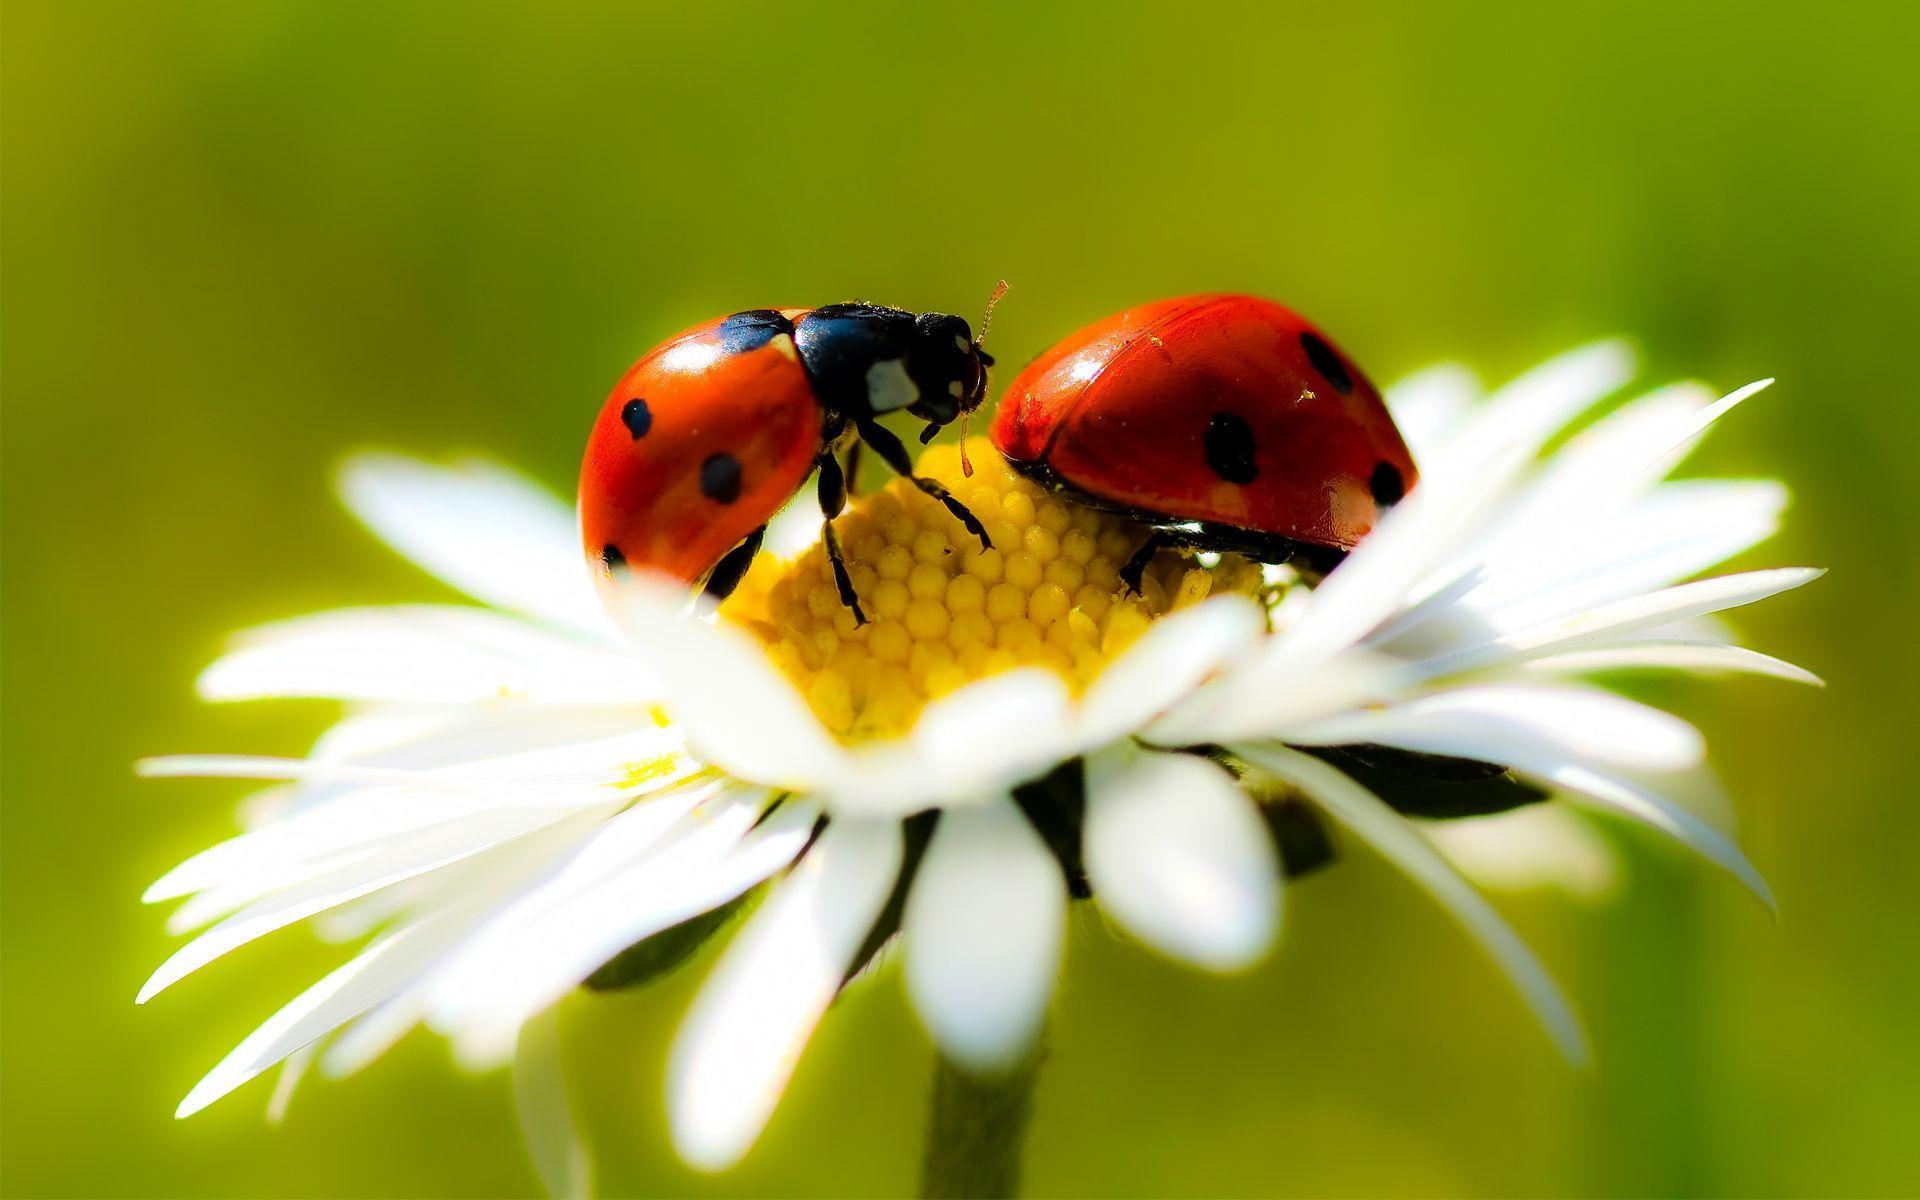 Фото божья коровка коробочка бабочка